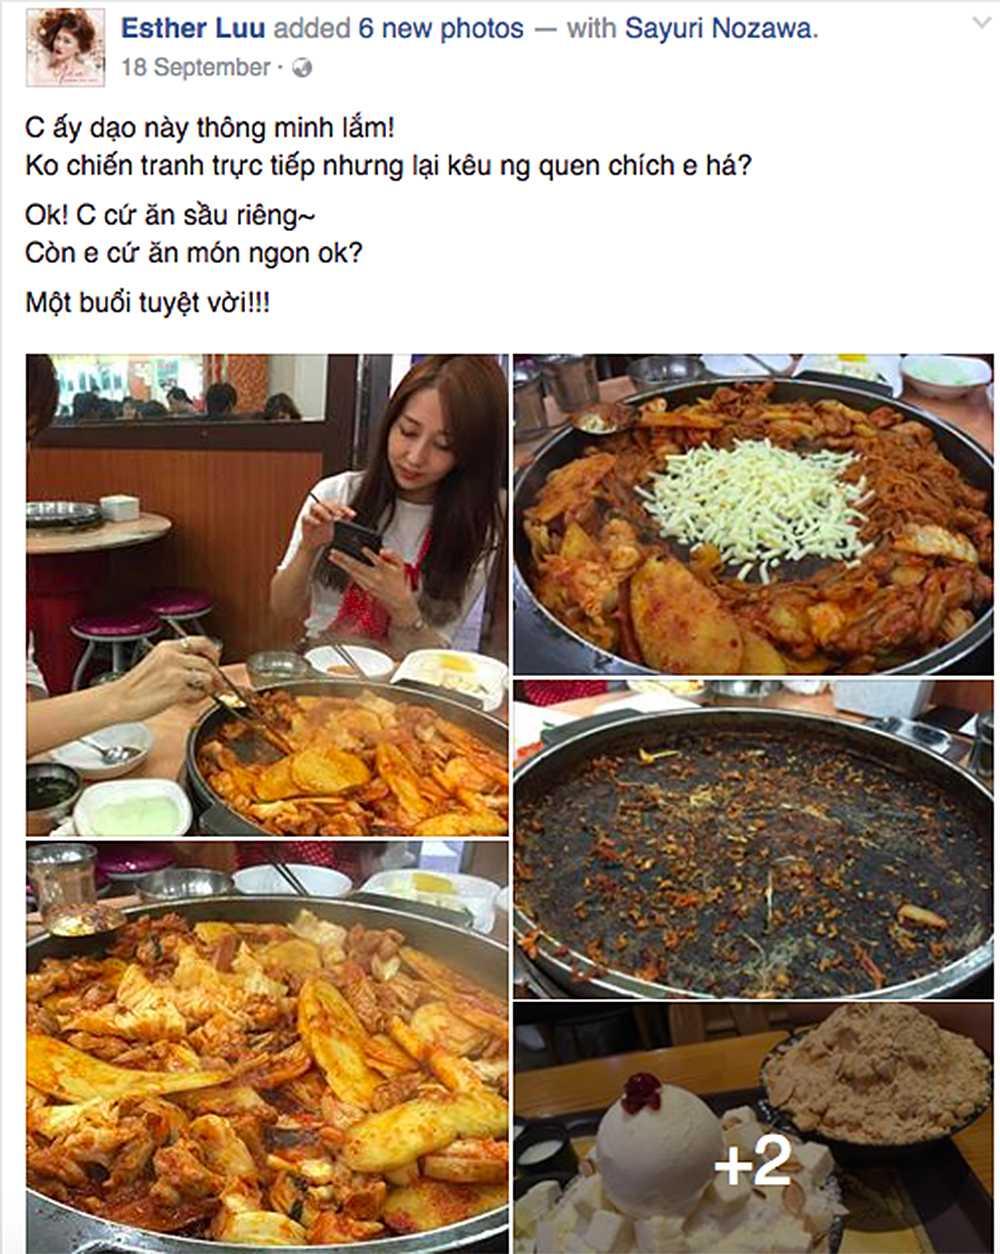 1001 cach 'hanh ha' quan ly sieu de thuong cua Hari Won hinh anh 1